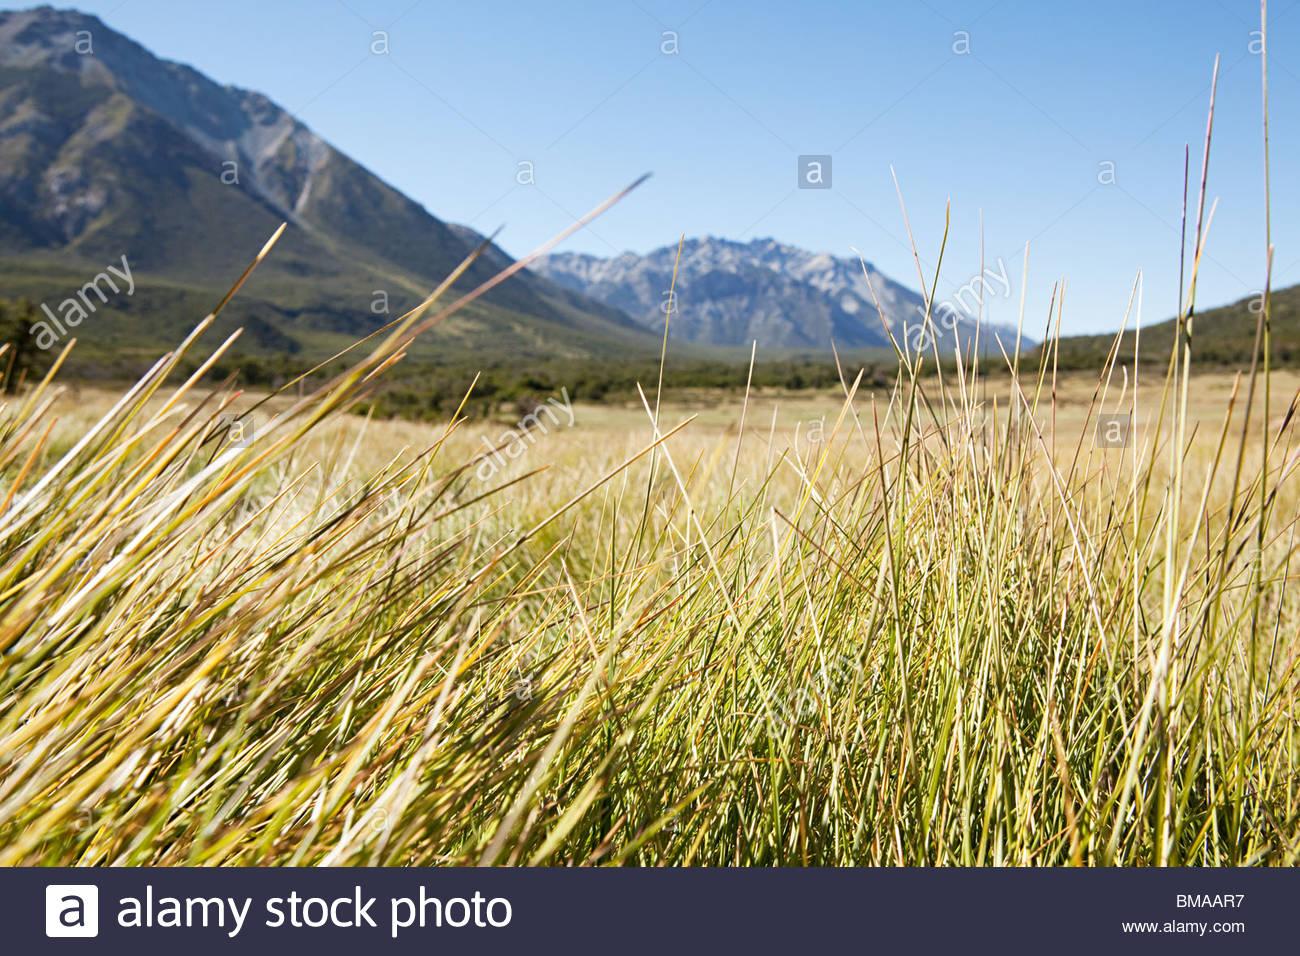 Peaceful rural landscape in argentina - Stock Image